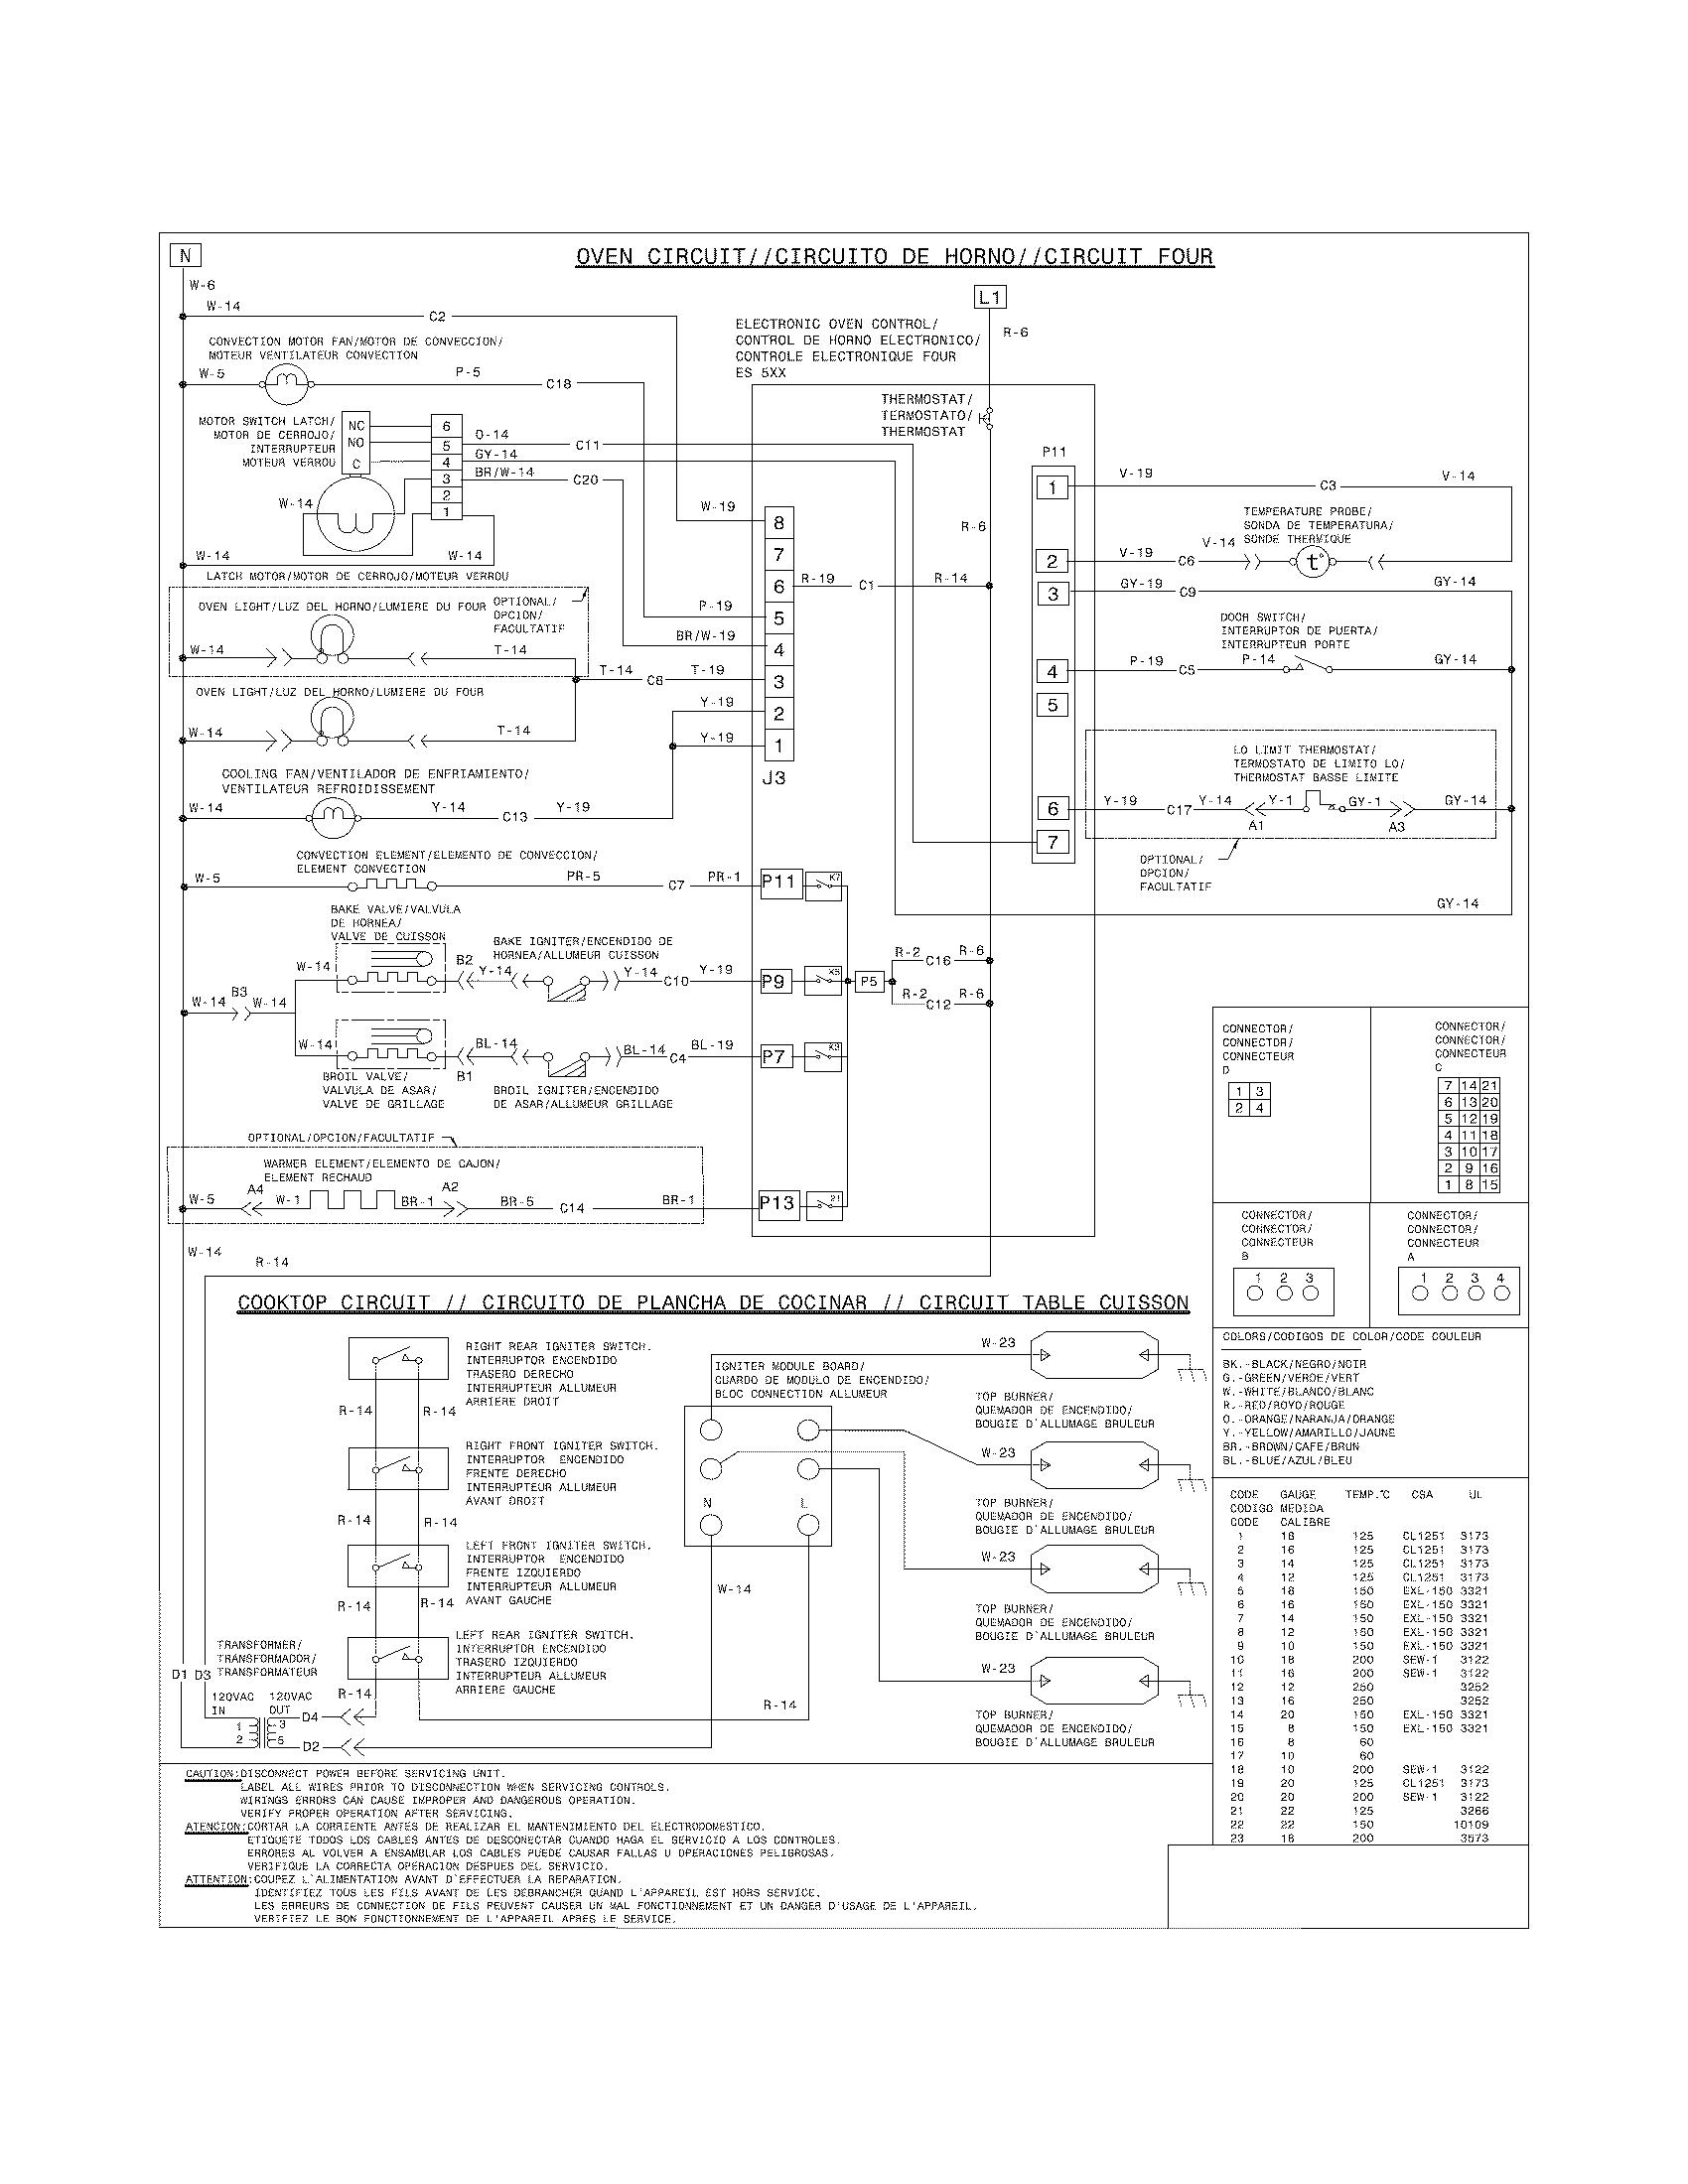 R1505025 00006?resize\=665%2C861 wesco furnace older wiring diagram circuit breaker wiring diagram wesco electric furnace wiring diagram at mifinder.co